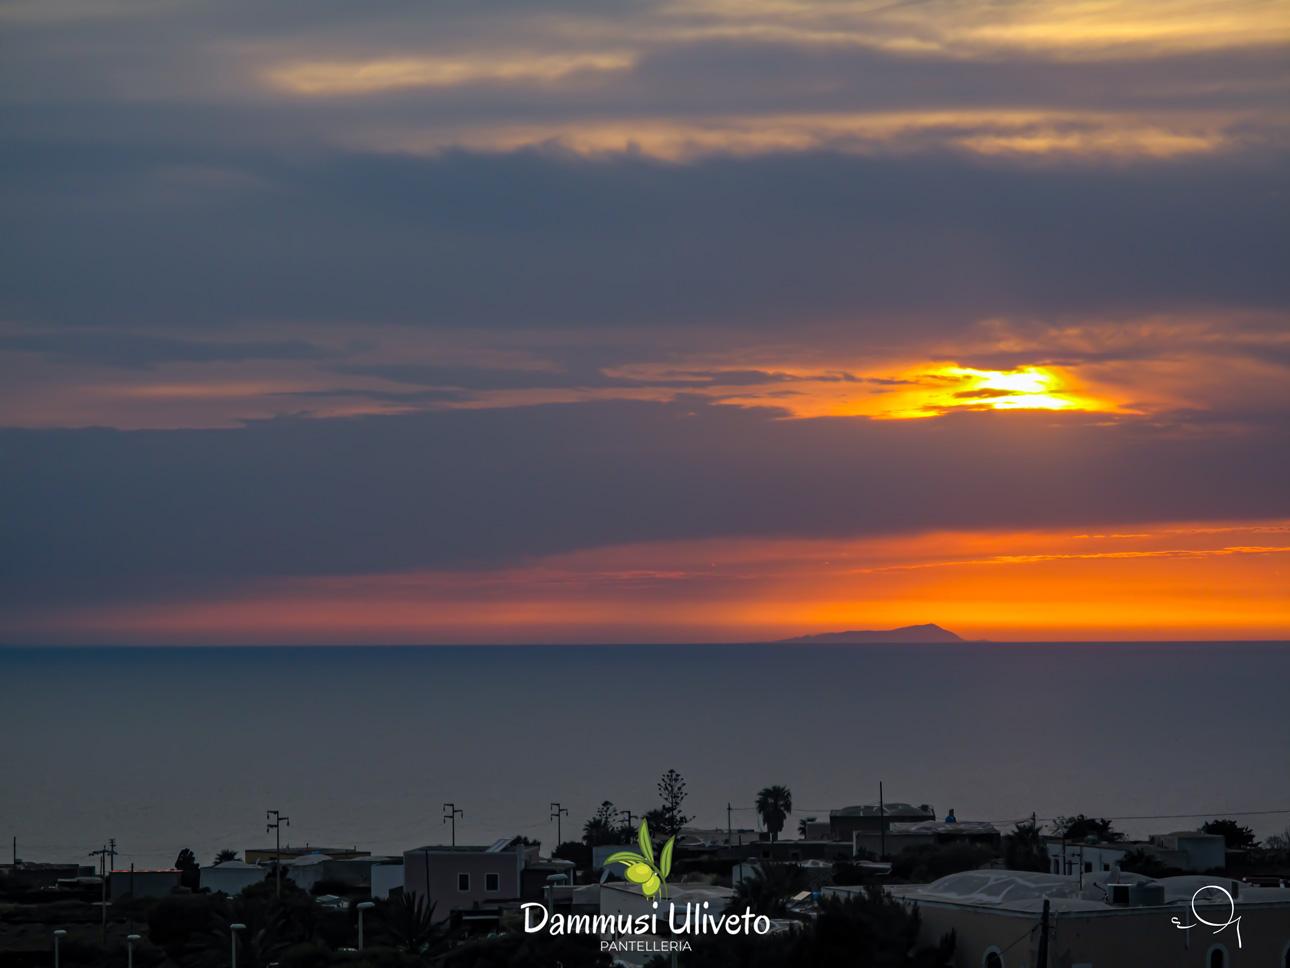 Le coste Africane - Dammusi Uliveto